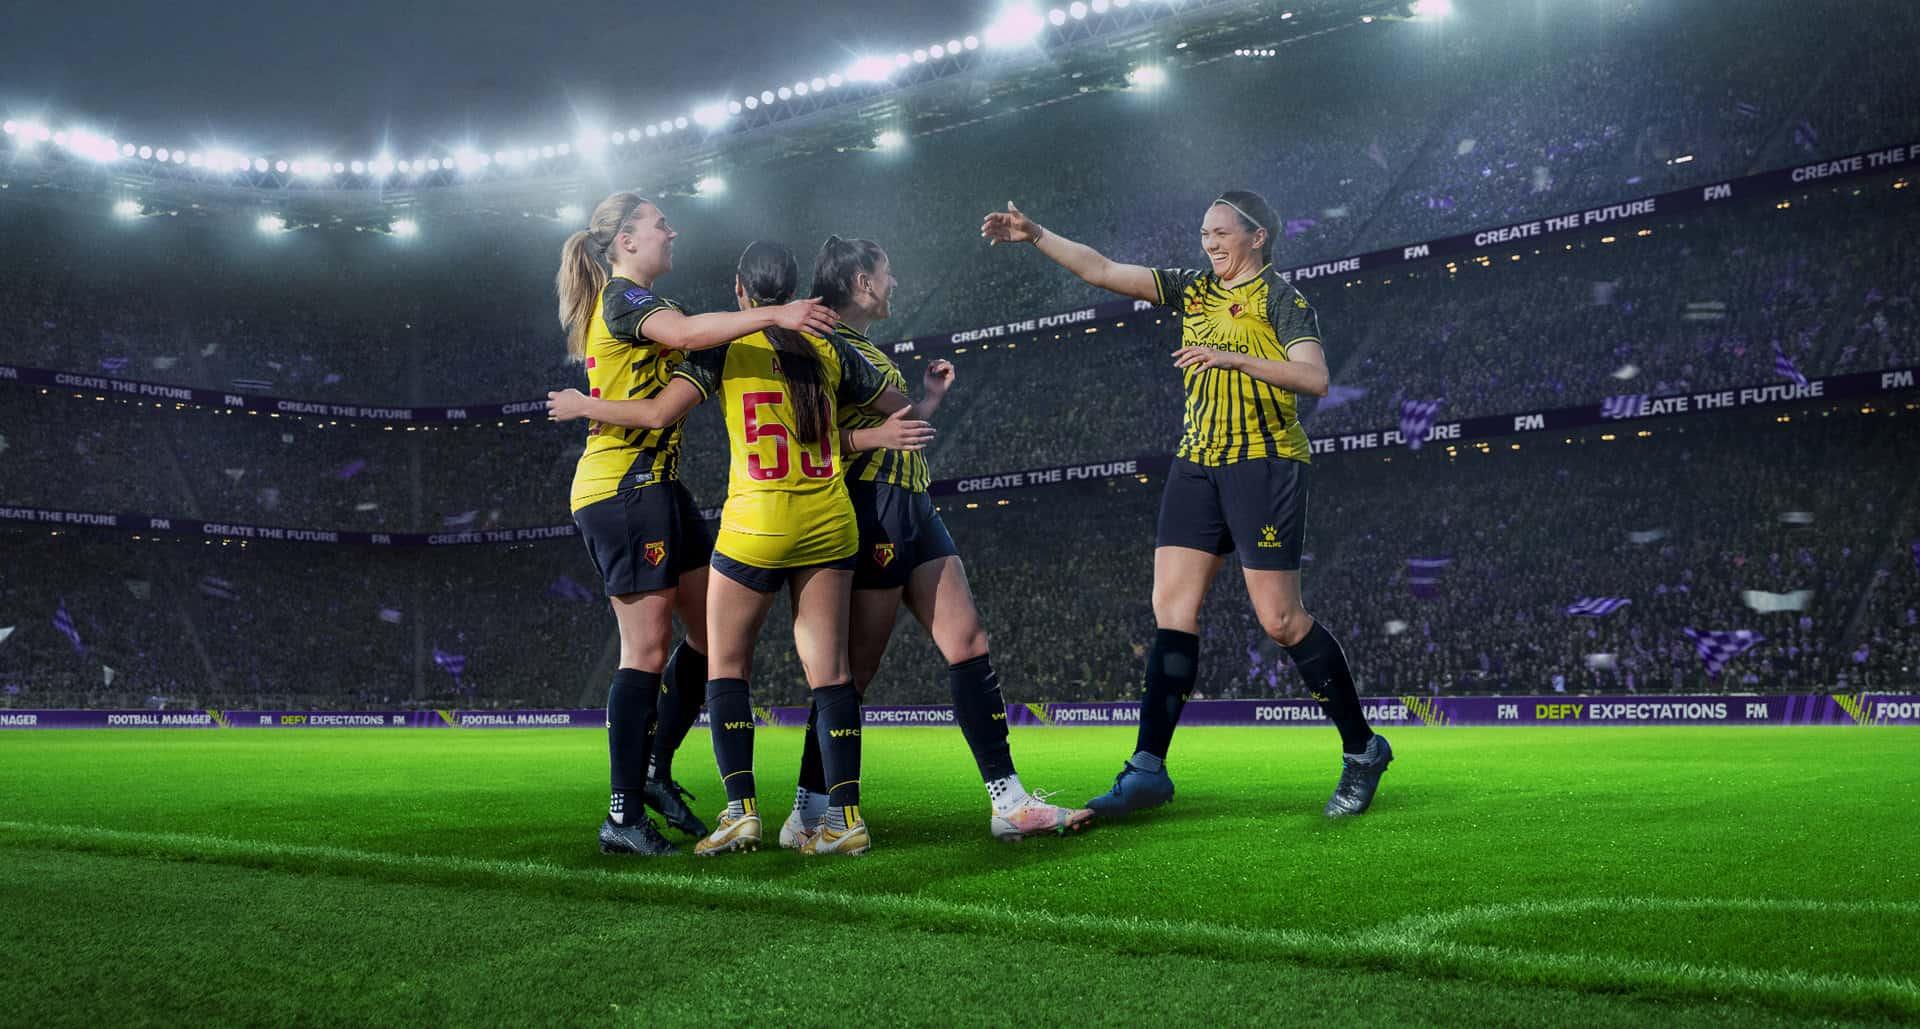 Football Manager women's football